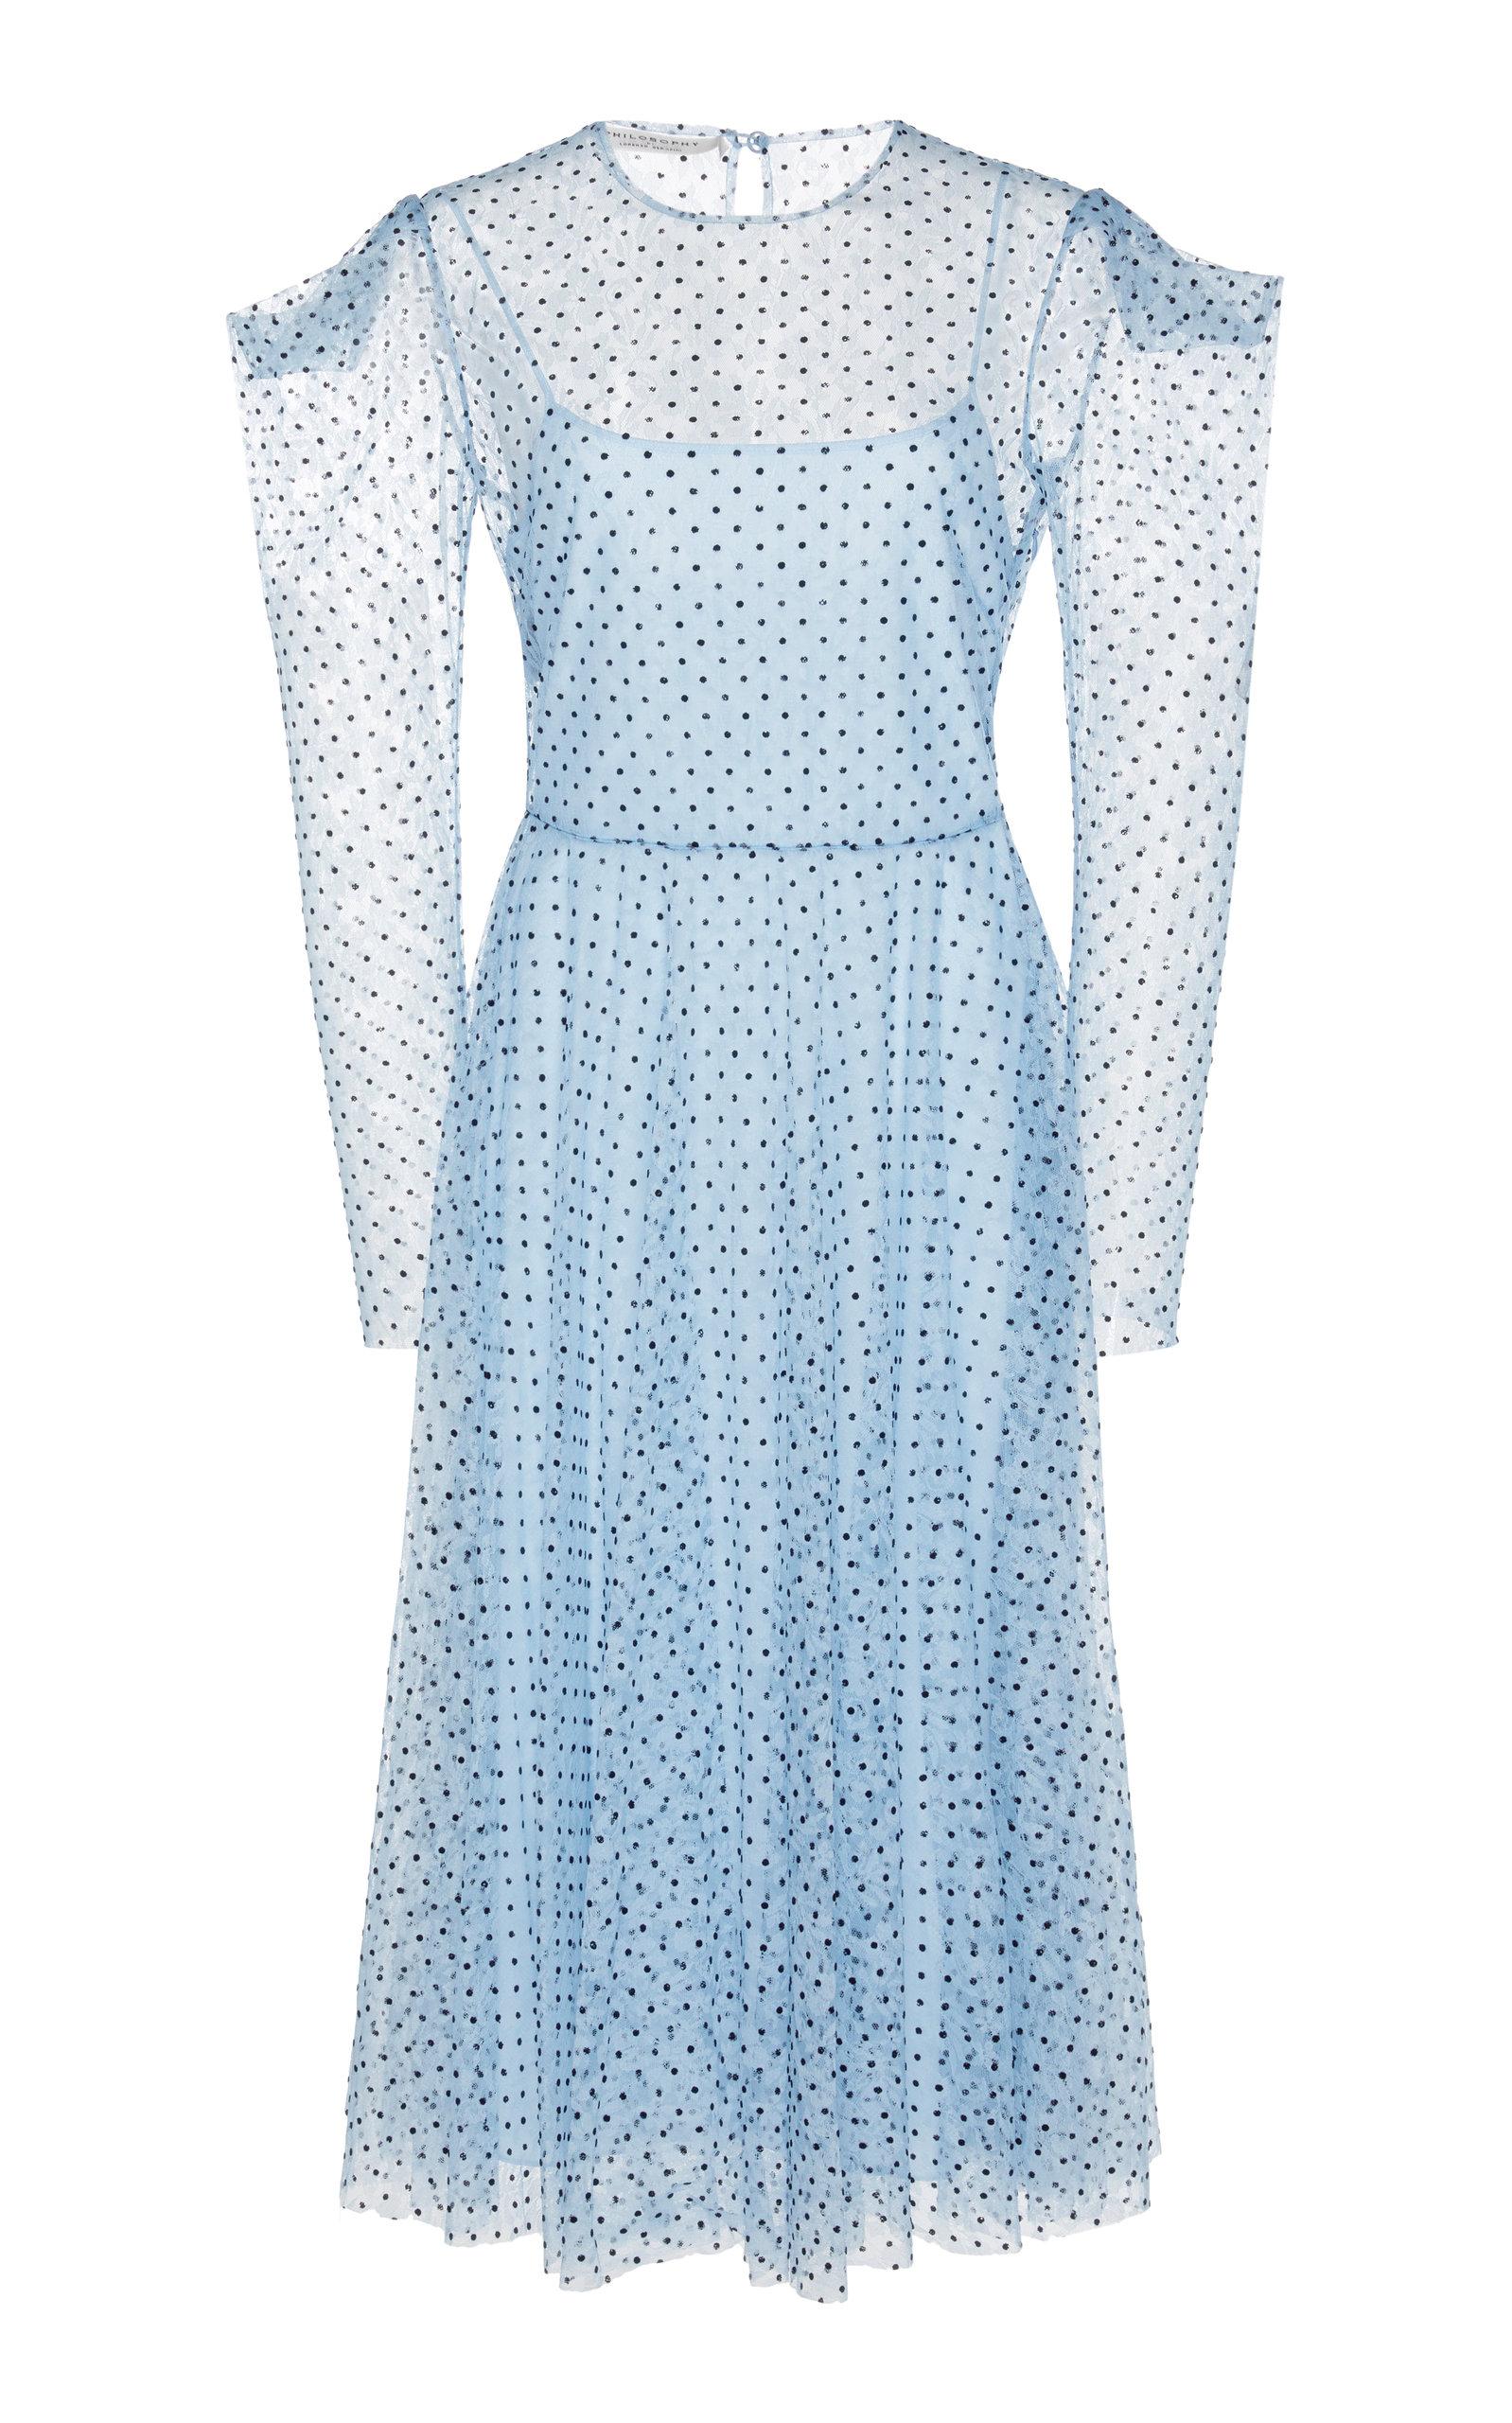 Buy Philosophy di Lorenzo Serafini Polka Dot Puff Shoulder Chiffon Dress online, shop Philosophy di Lorenzo Serafini at the best price